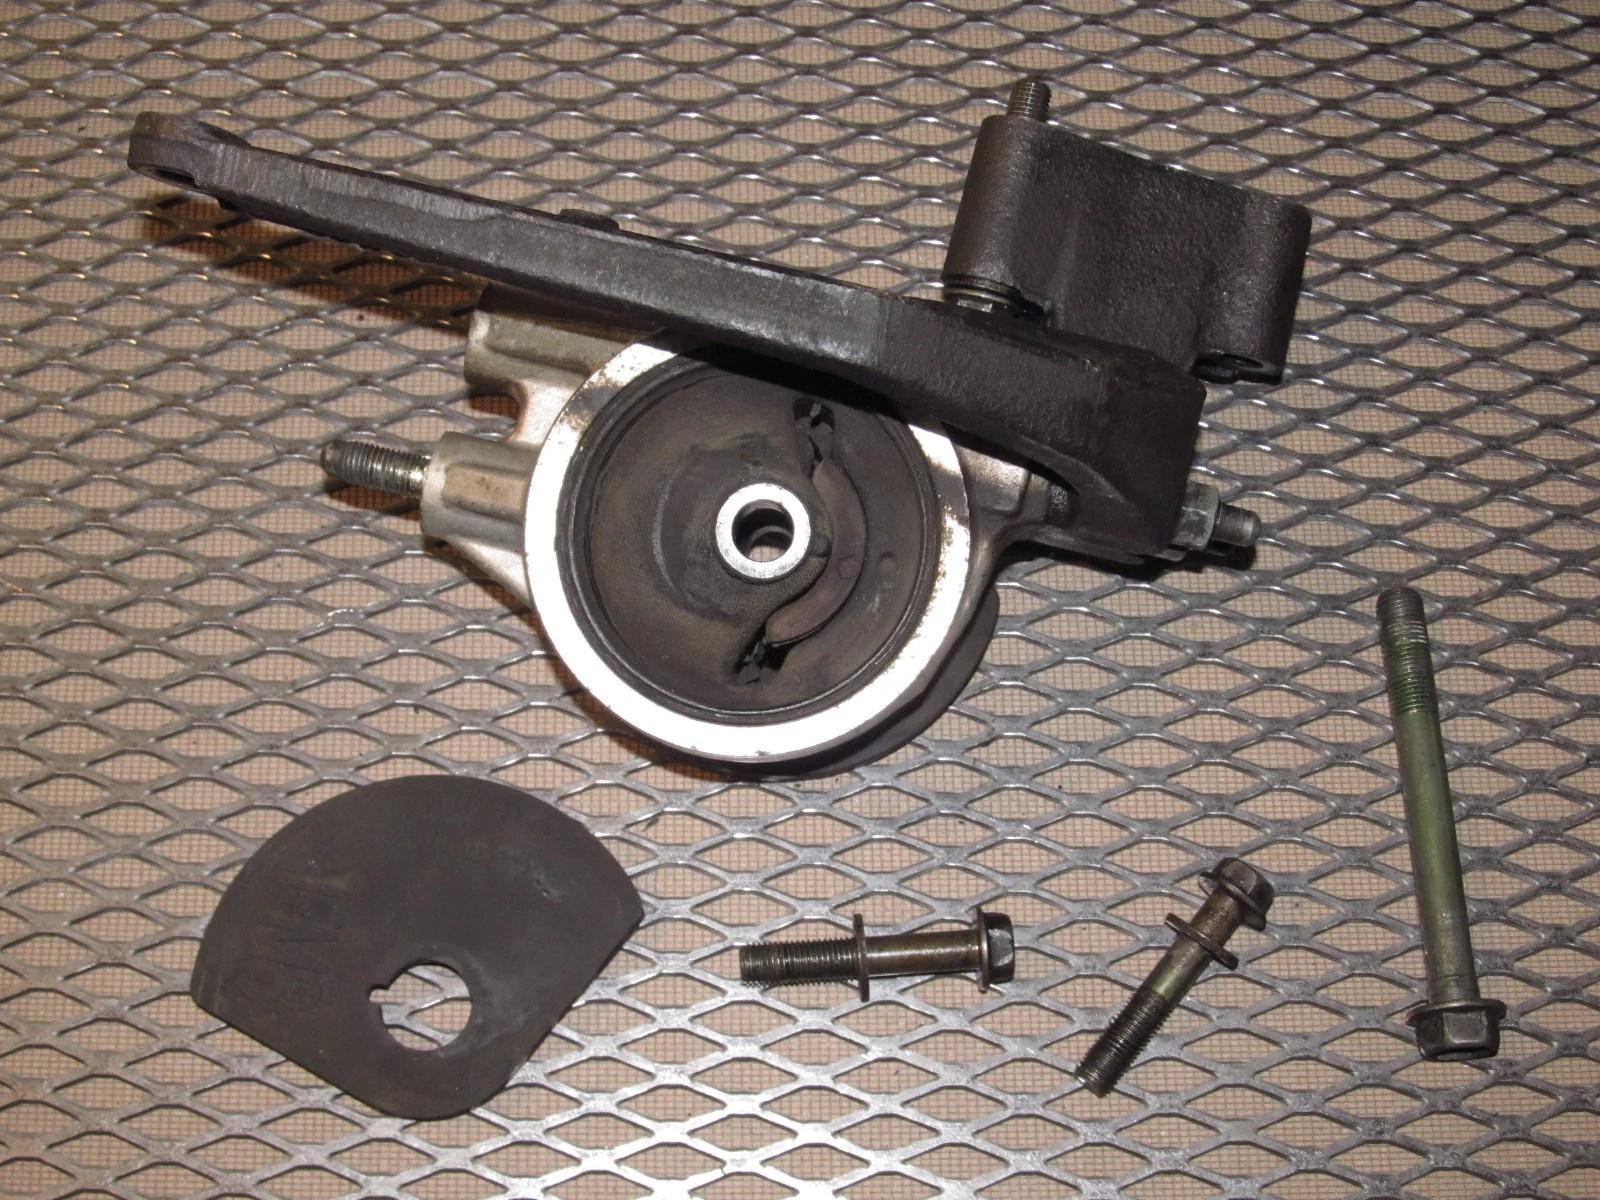 91 92 93 94 95 toyota mr2 oem 2 2l engine motor mount bracket  [ 1600 x 1200 Pixel ]